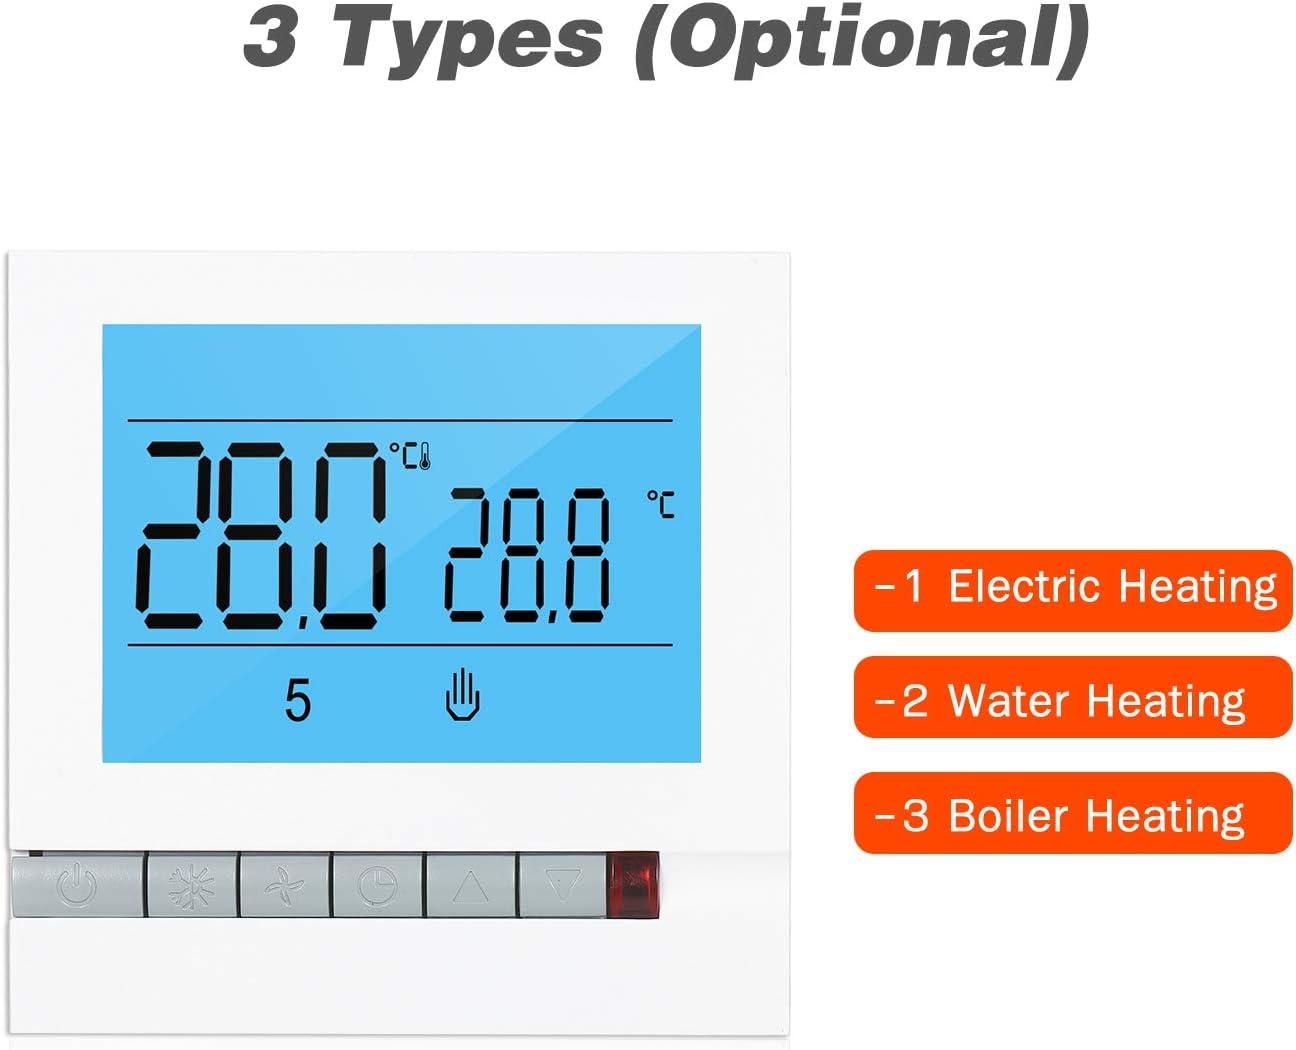 Kecheer Termostato suelo radiante electrico programable,Termostato wifi calefaccion para suelo radiante electrico,Termostatos calefaccion con retroiluminaci/ón